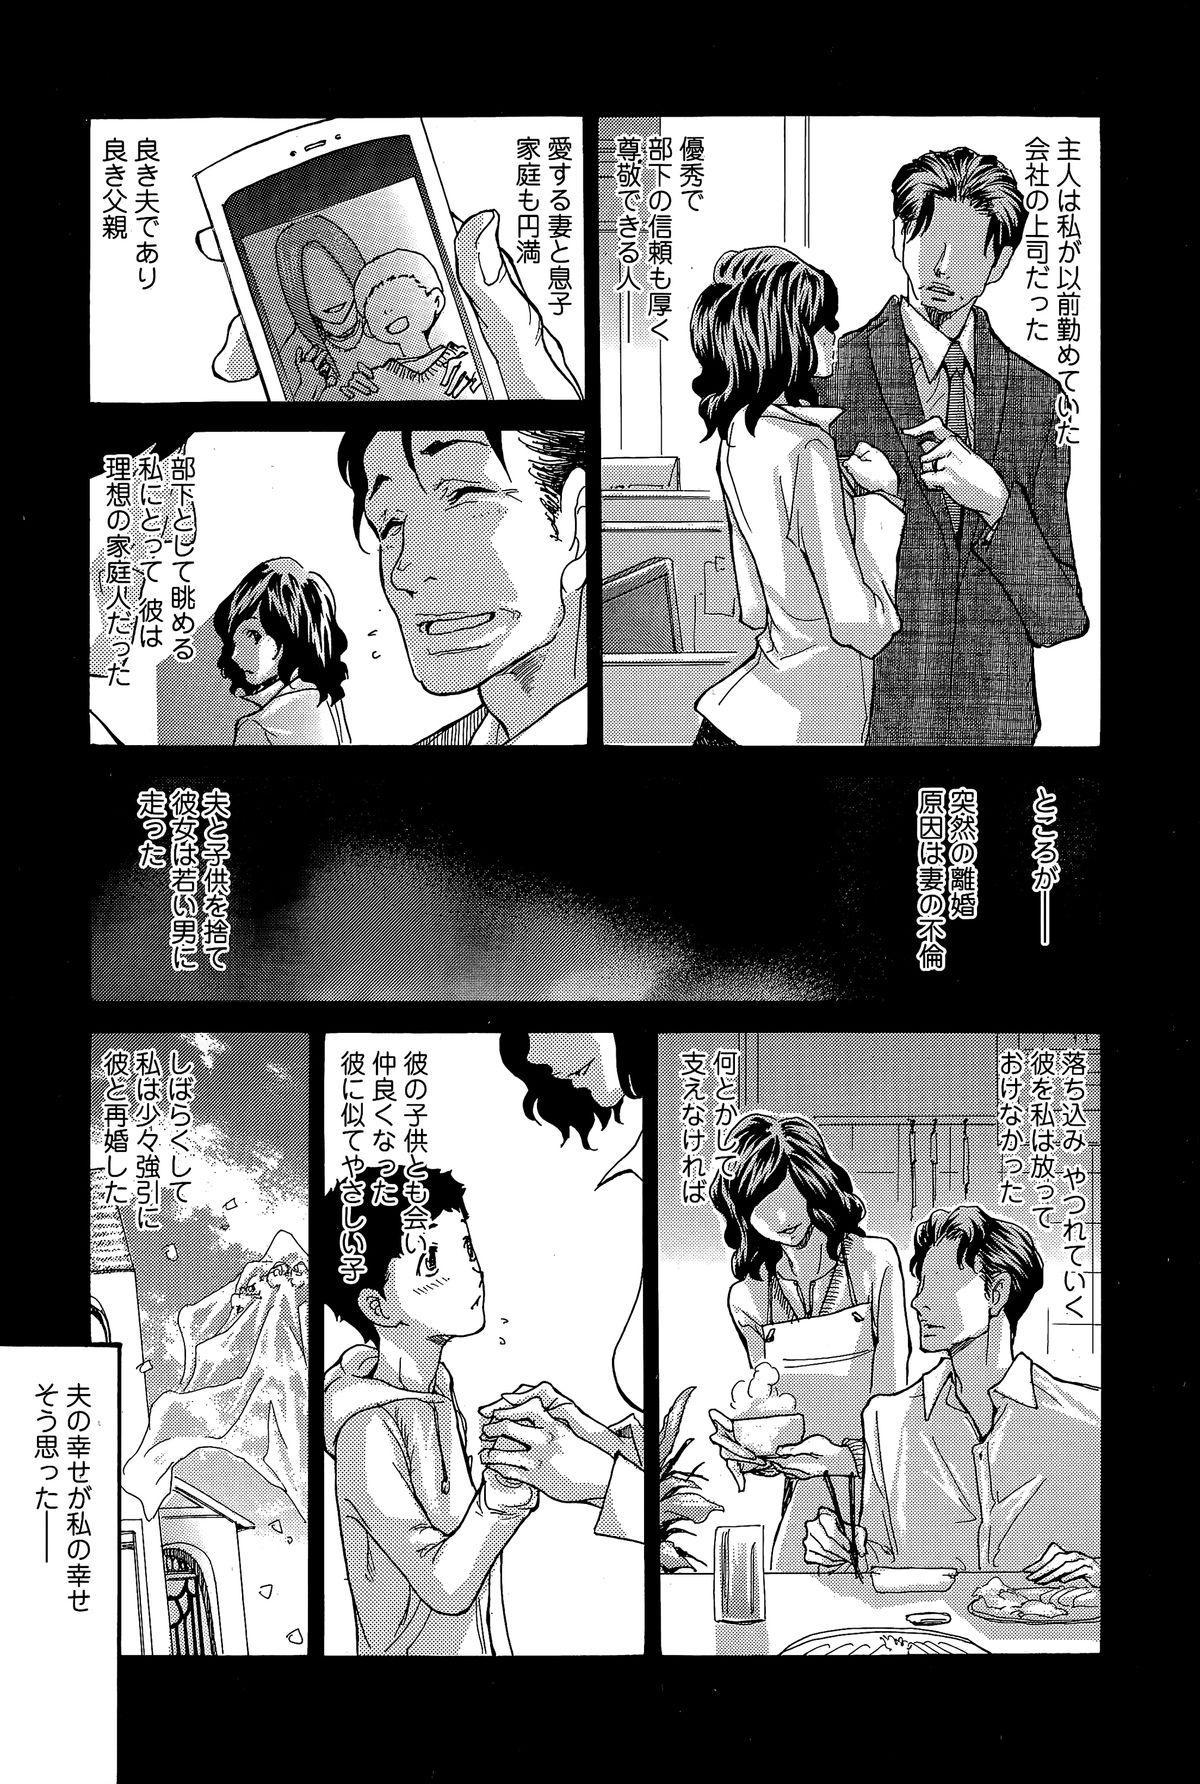 Comic Toutetsu 2015-02 Vol. 3 122